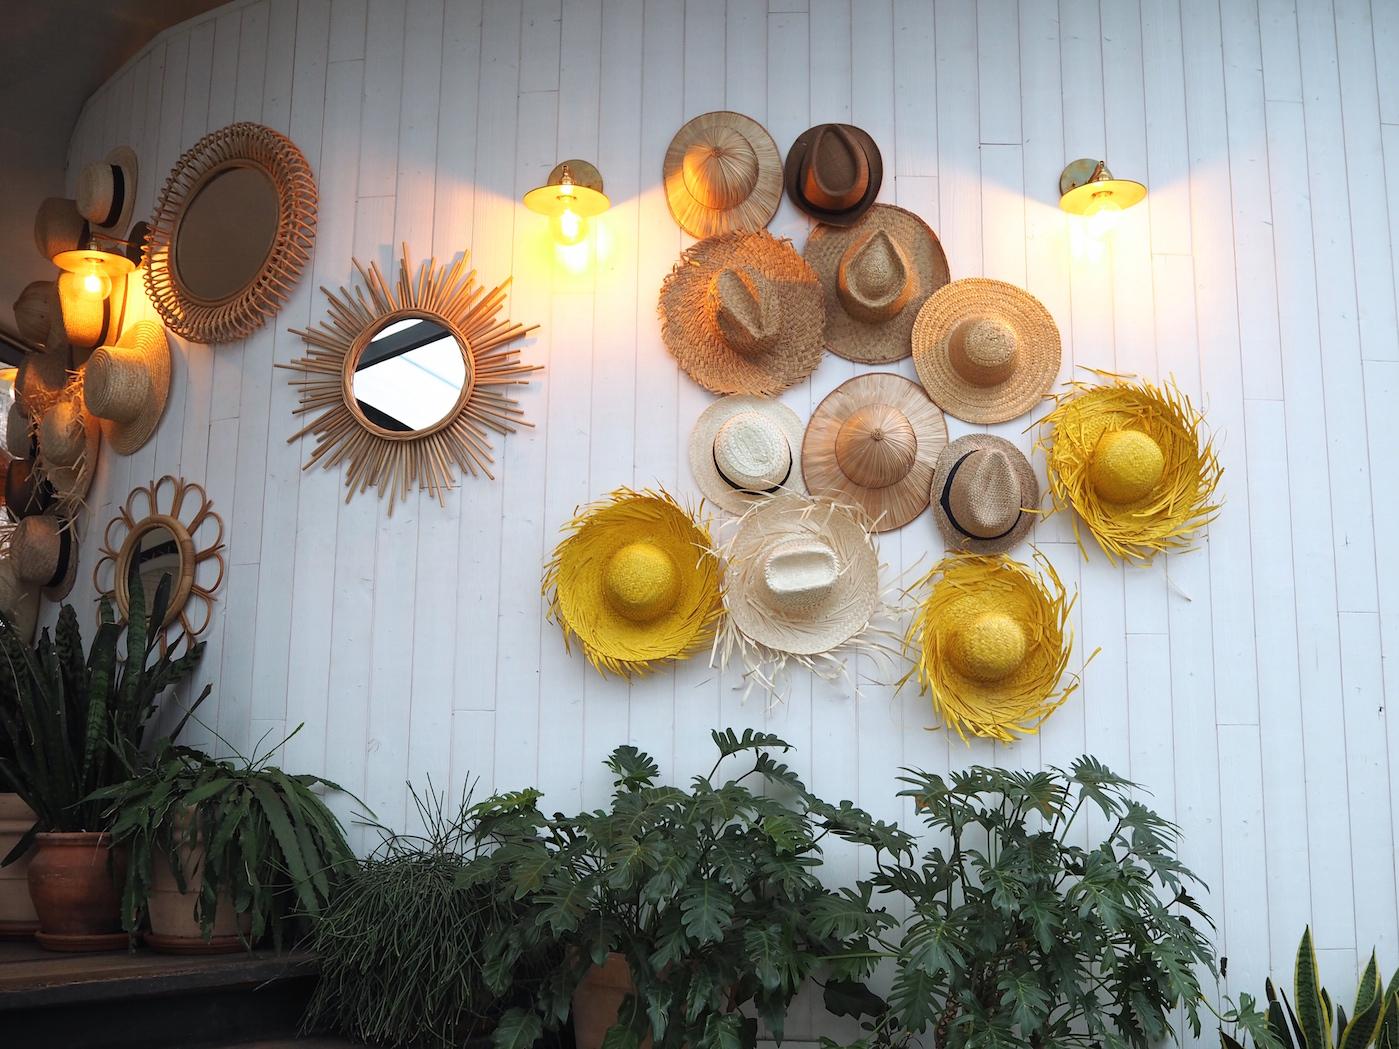 brasserie polpo mur de chapeaux